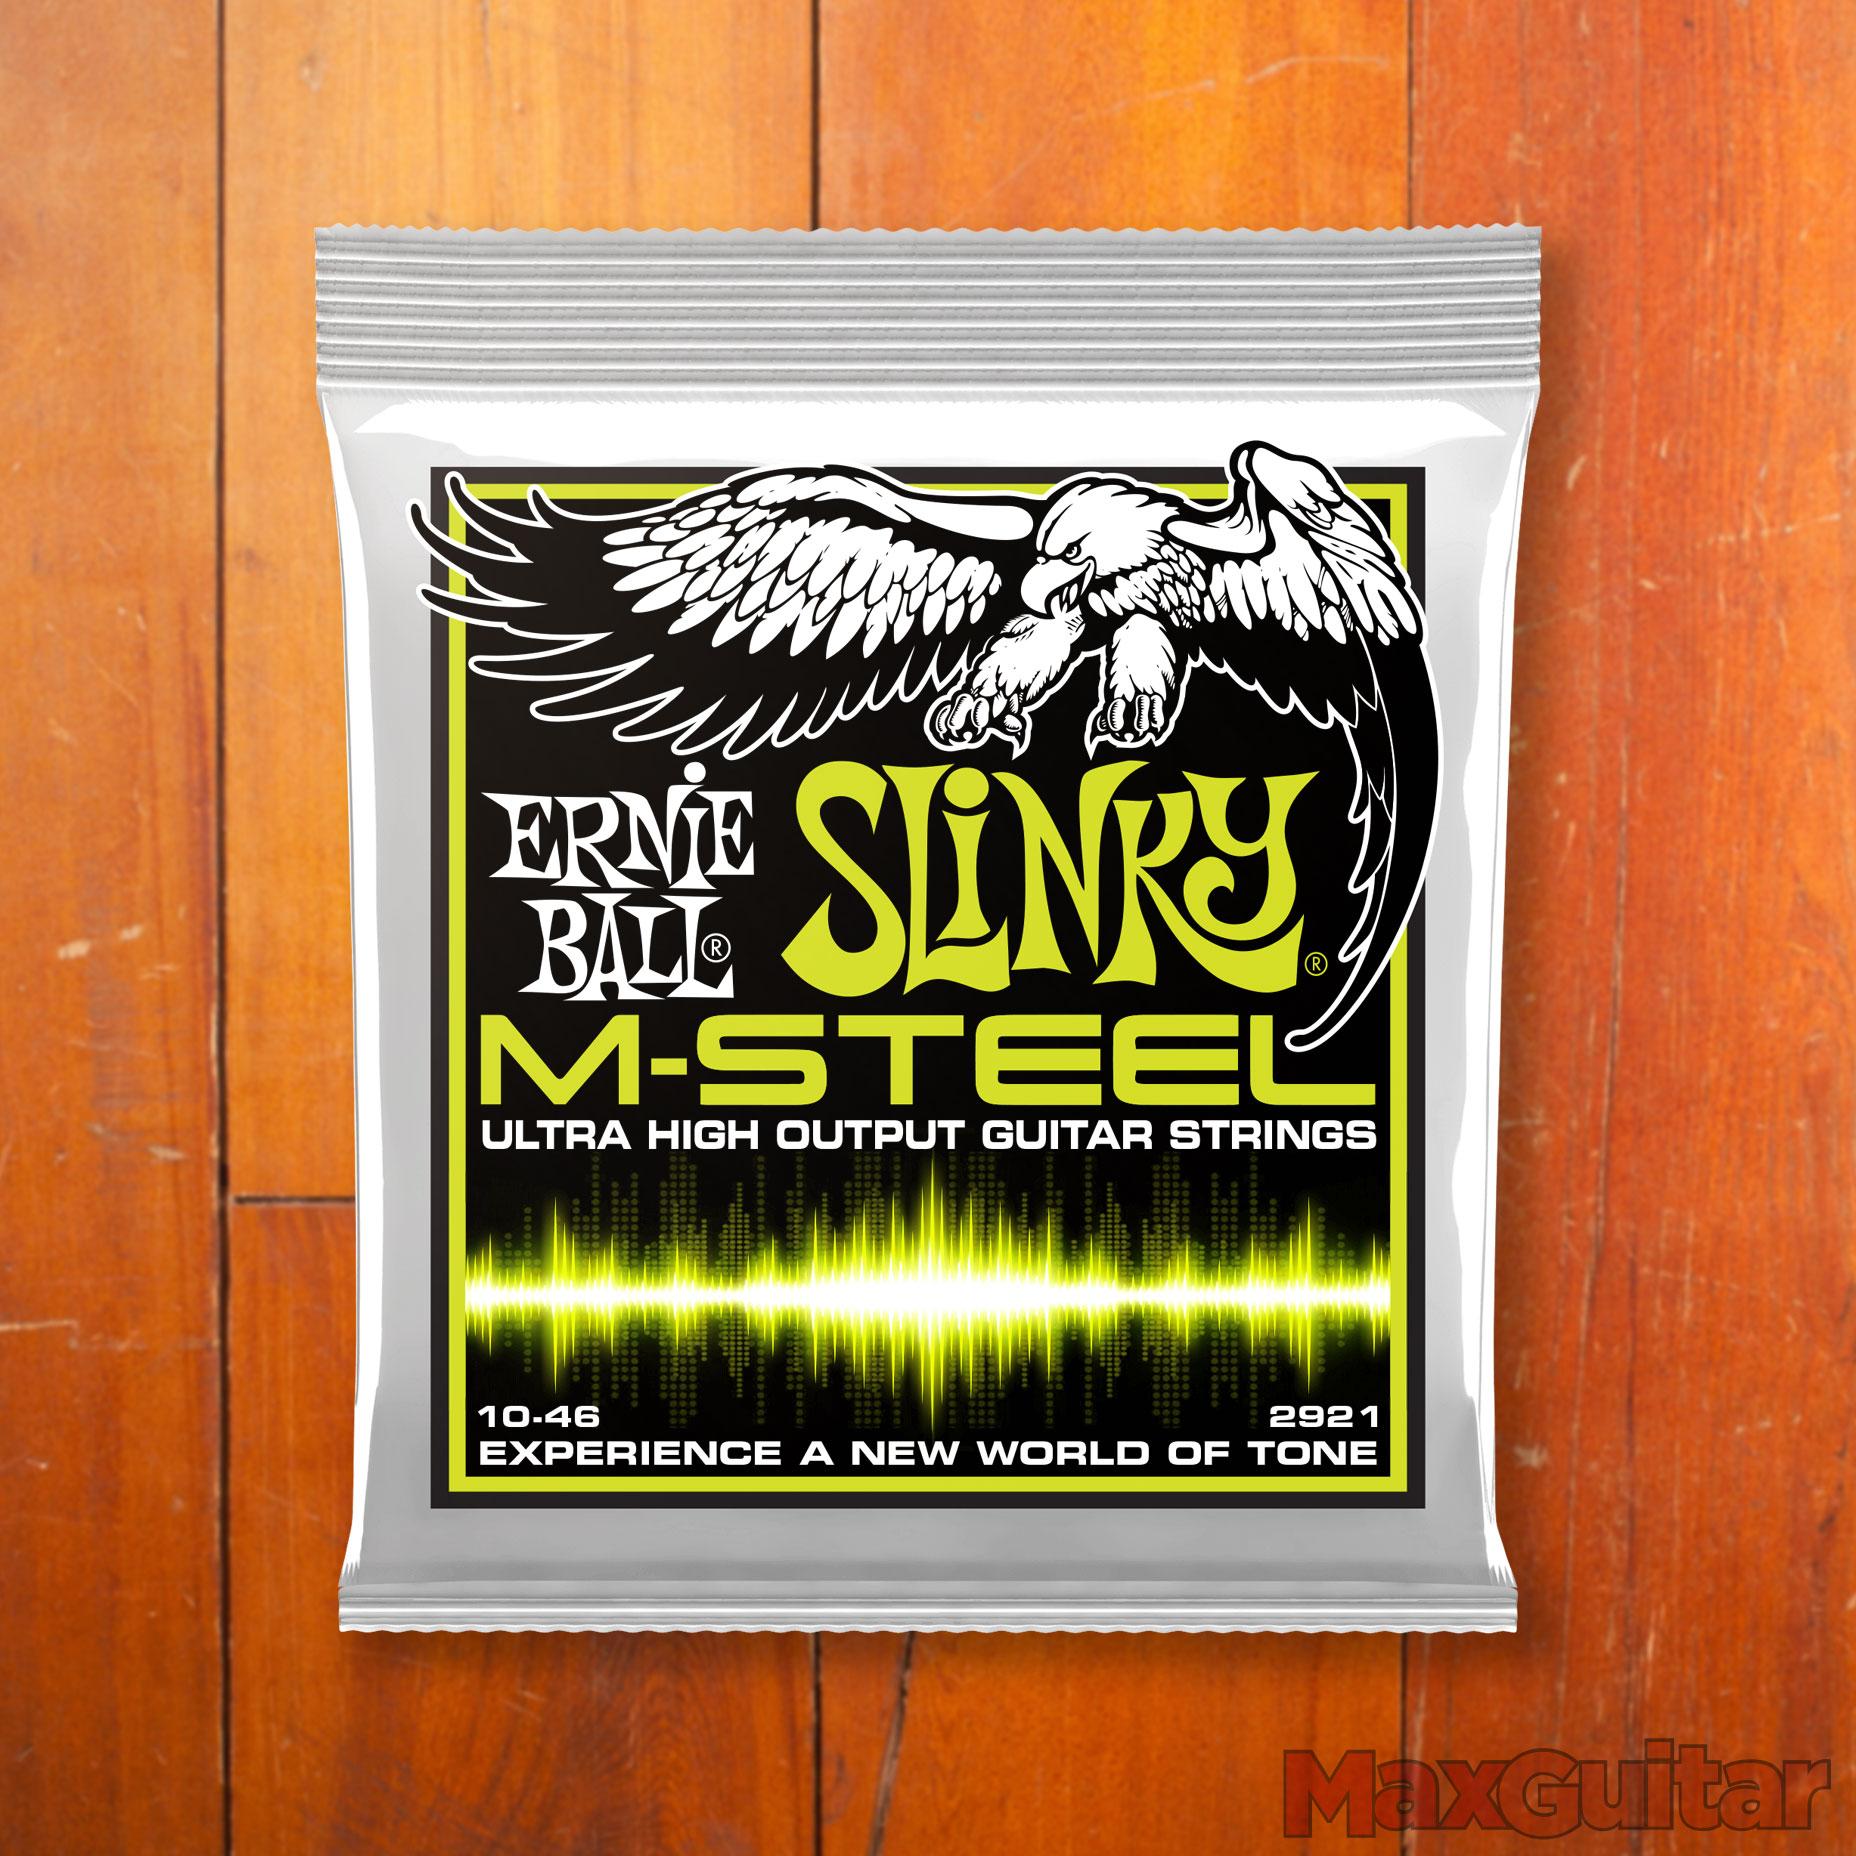 Ernie Ball M-Steel Regular Slinky 10-46